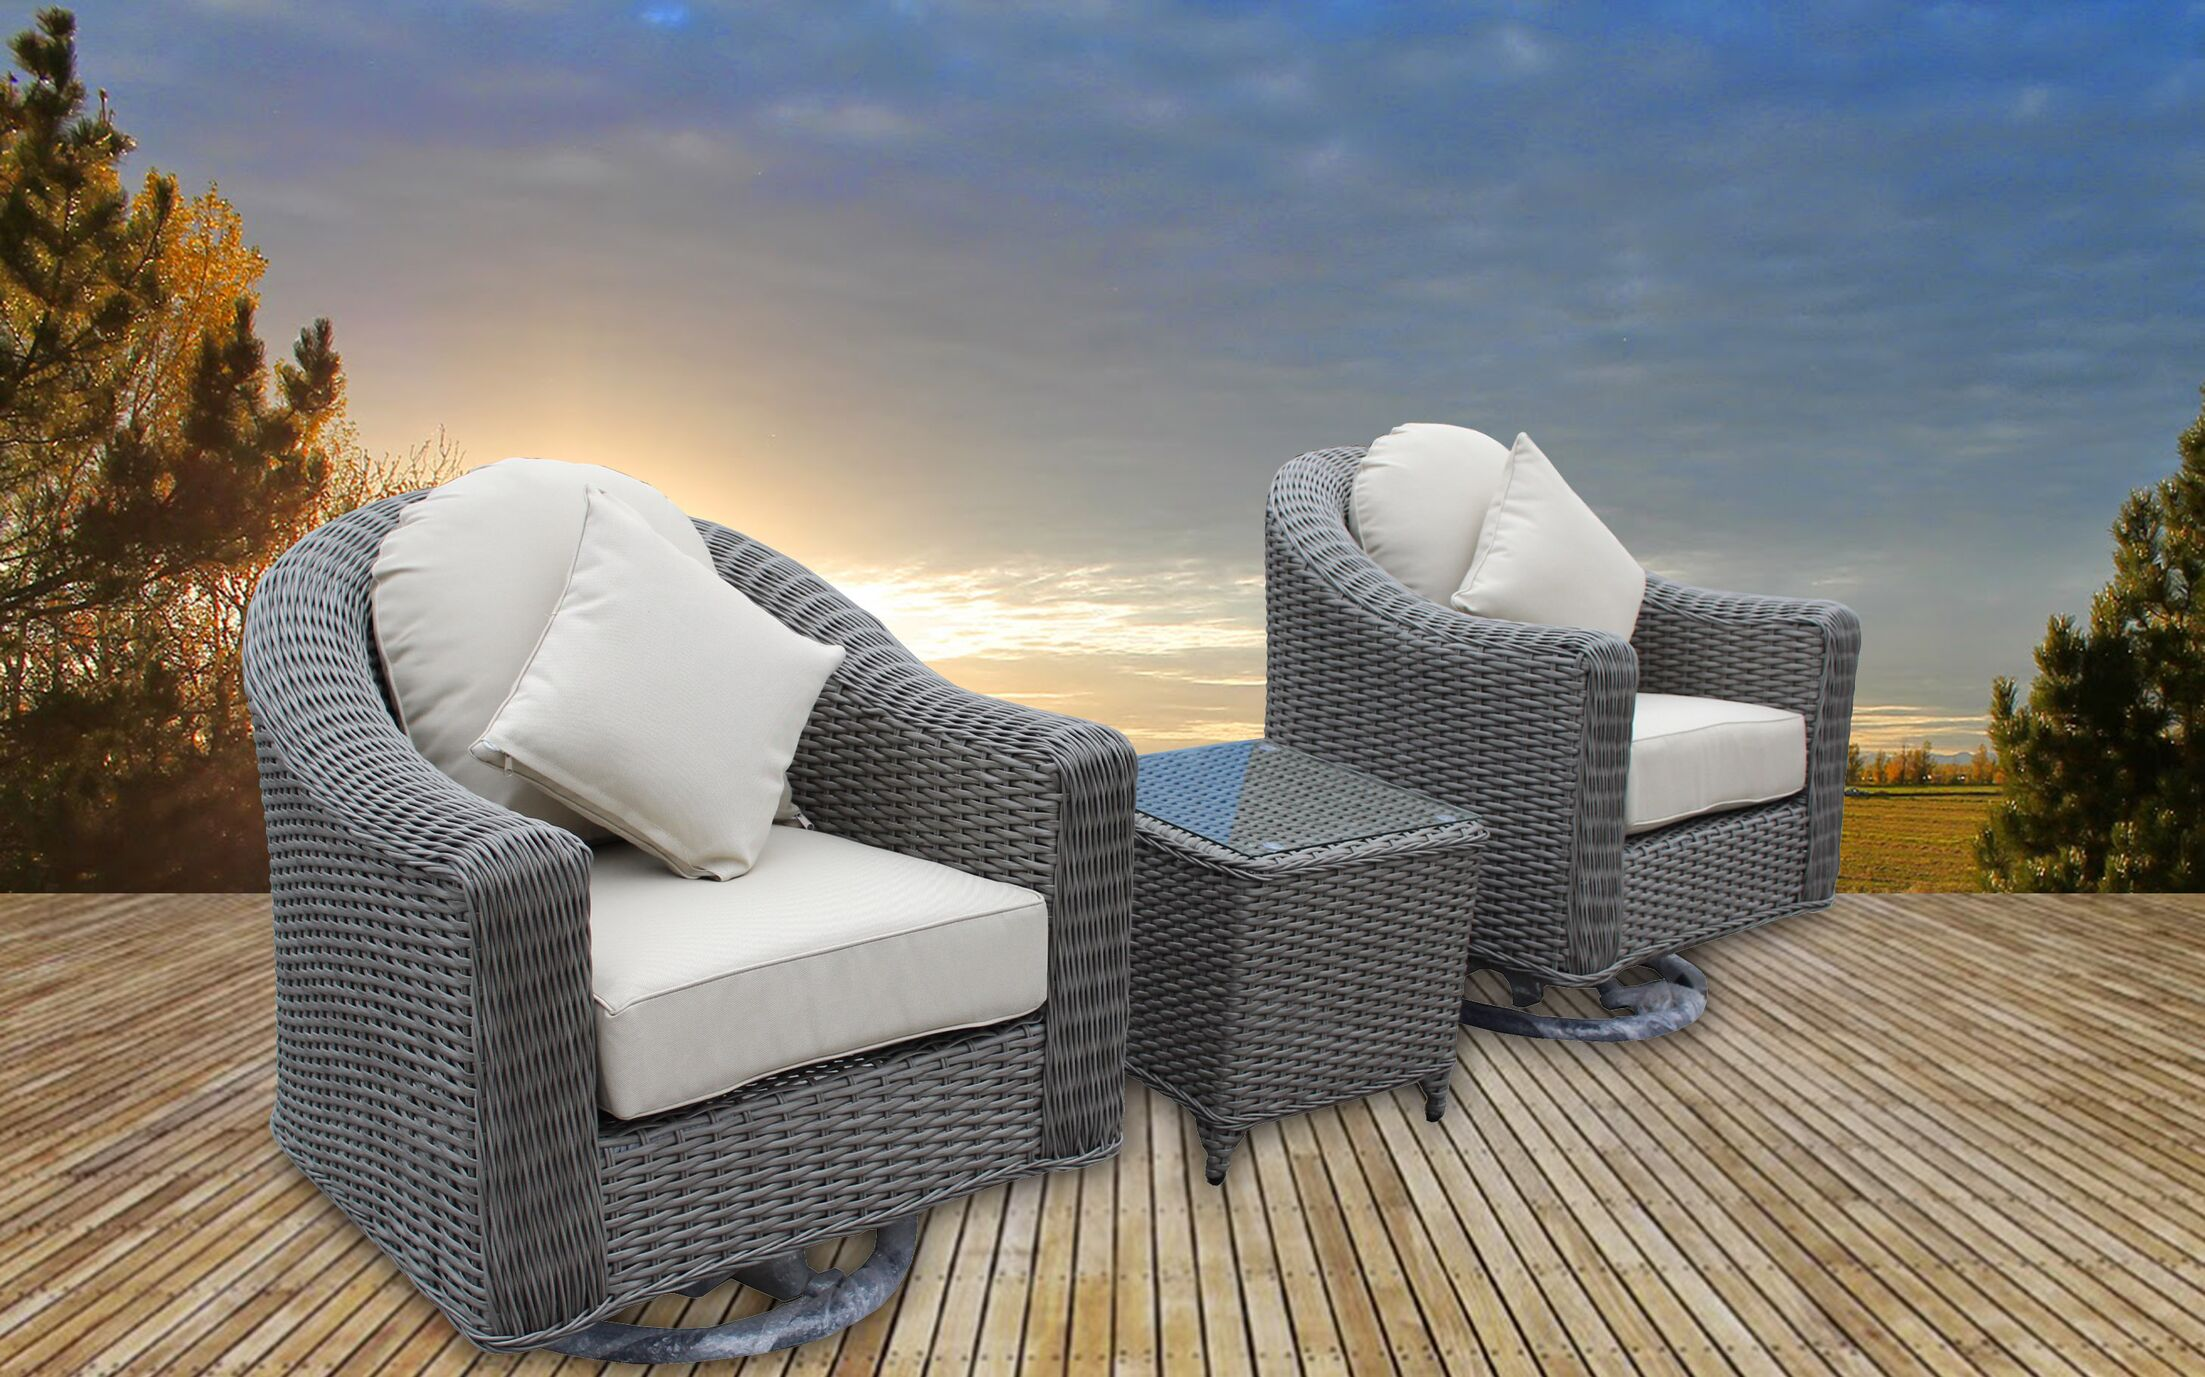 Geddes 3 Piece Sunbrella Conversation Set with Cushions Frame Color: Gray